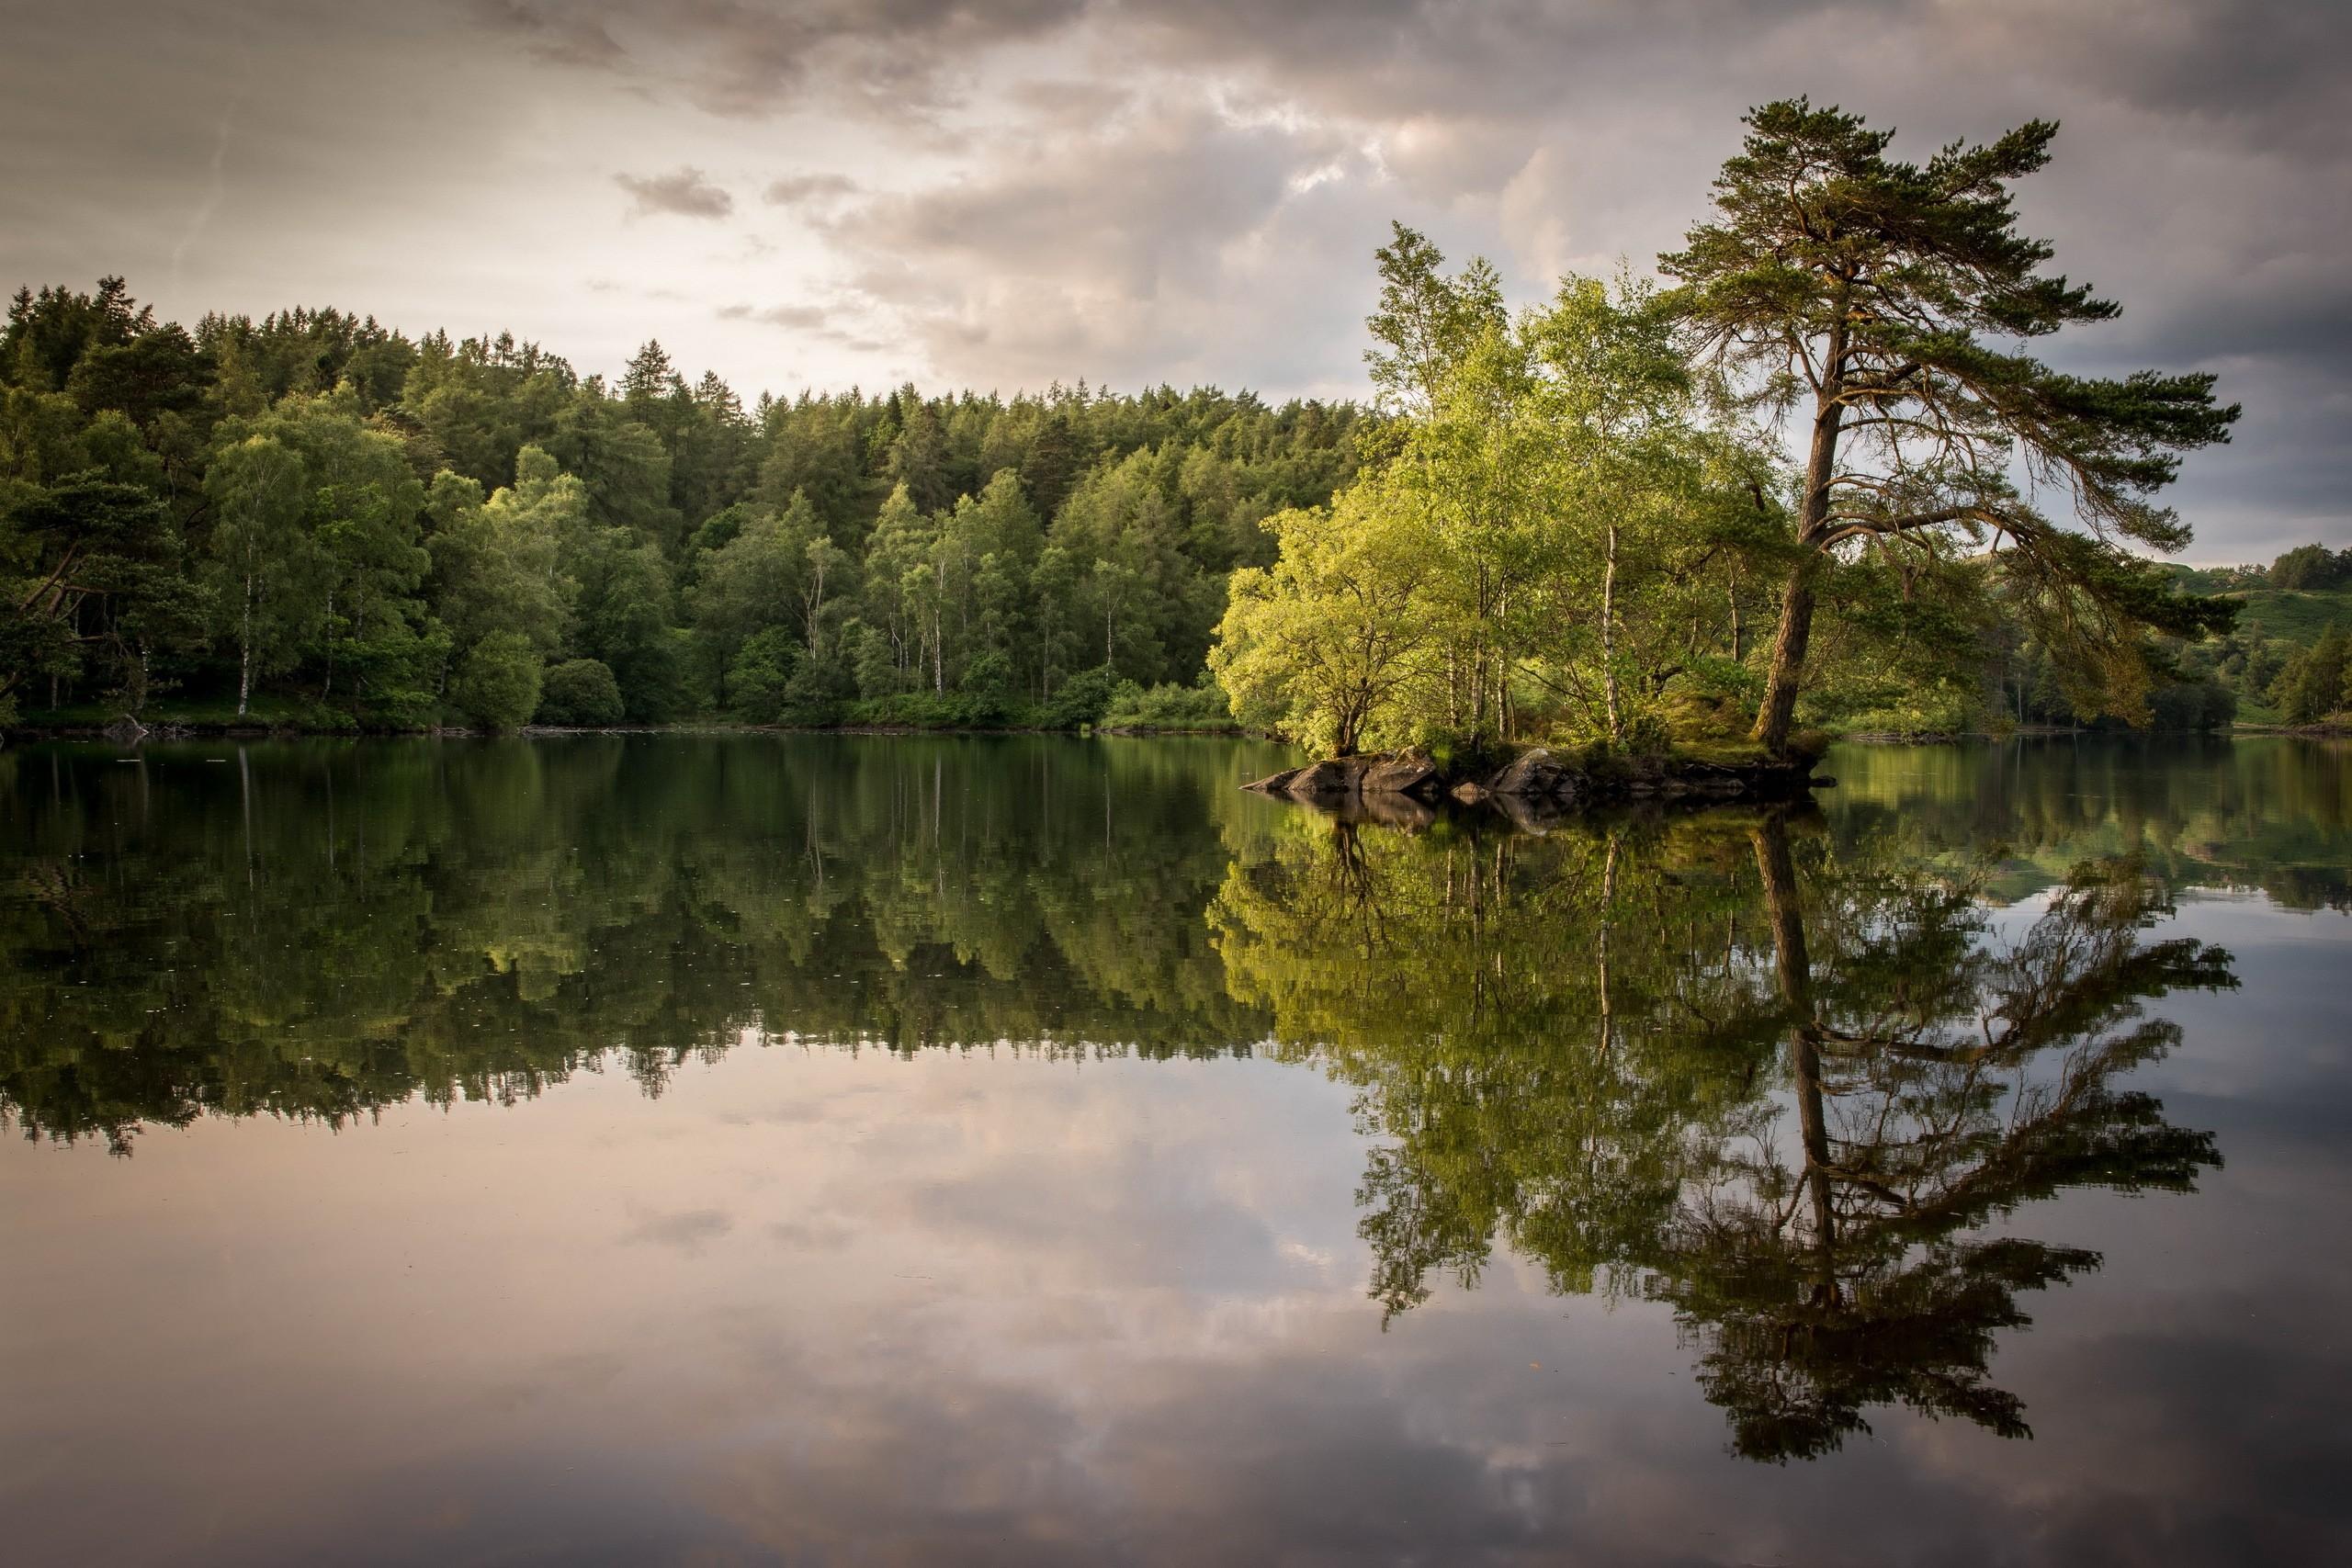 trees pine trees reflection lake